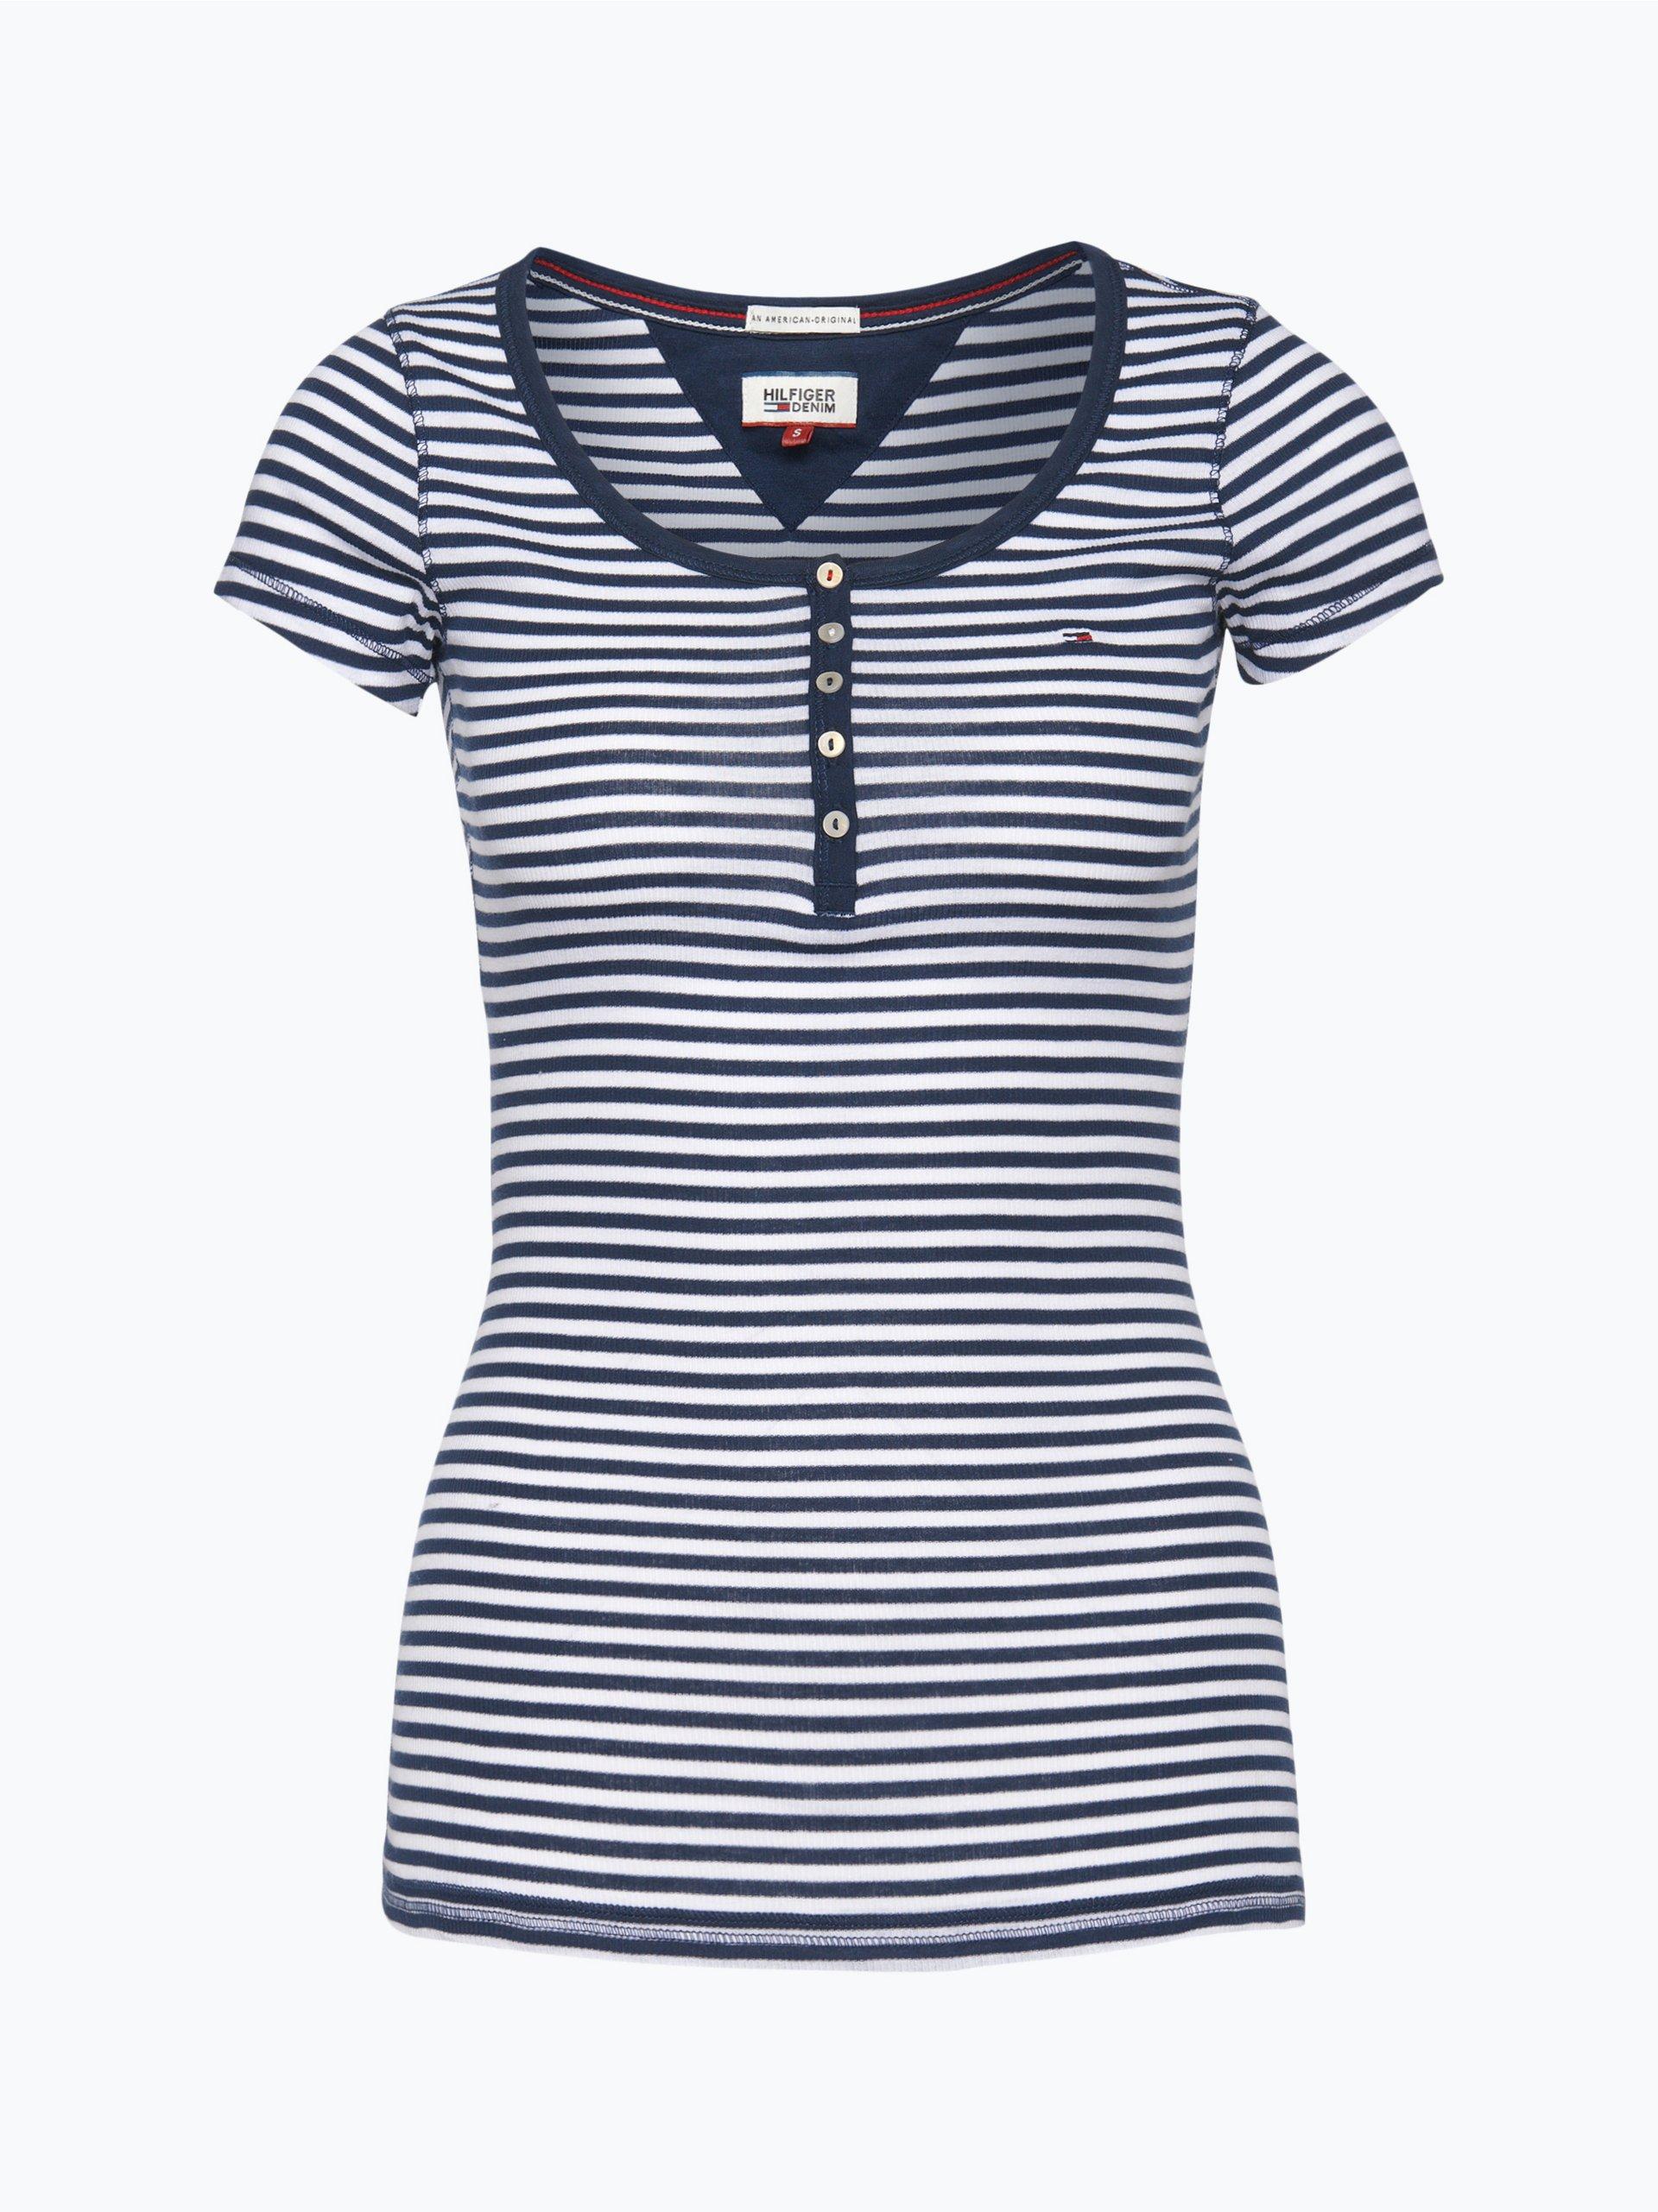 tommy jeans damen t shirt marine gestreift online kaufen. Black Bedroom Furniture Sets. Home Design Ideas